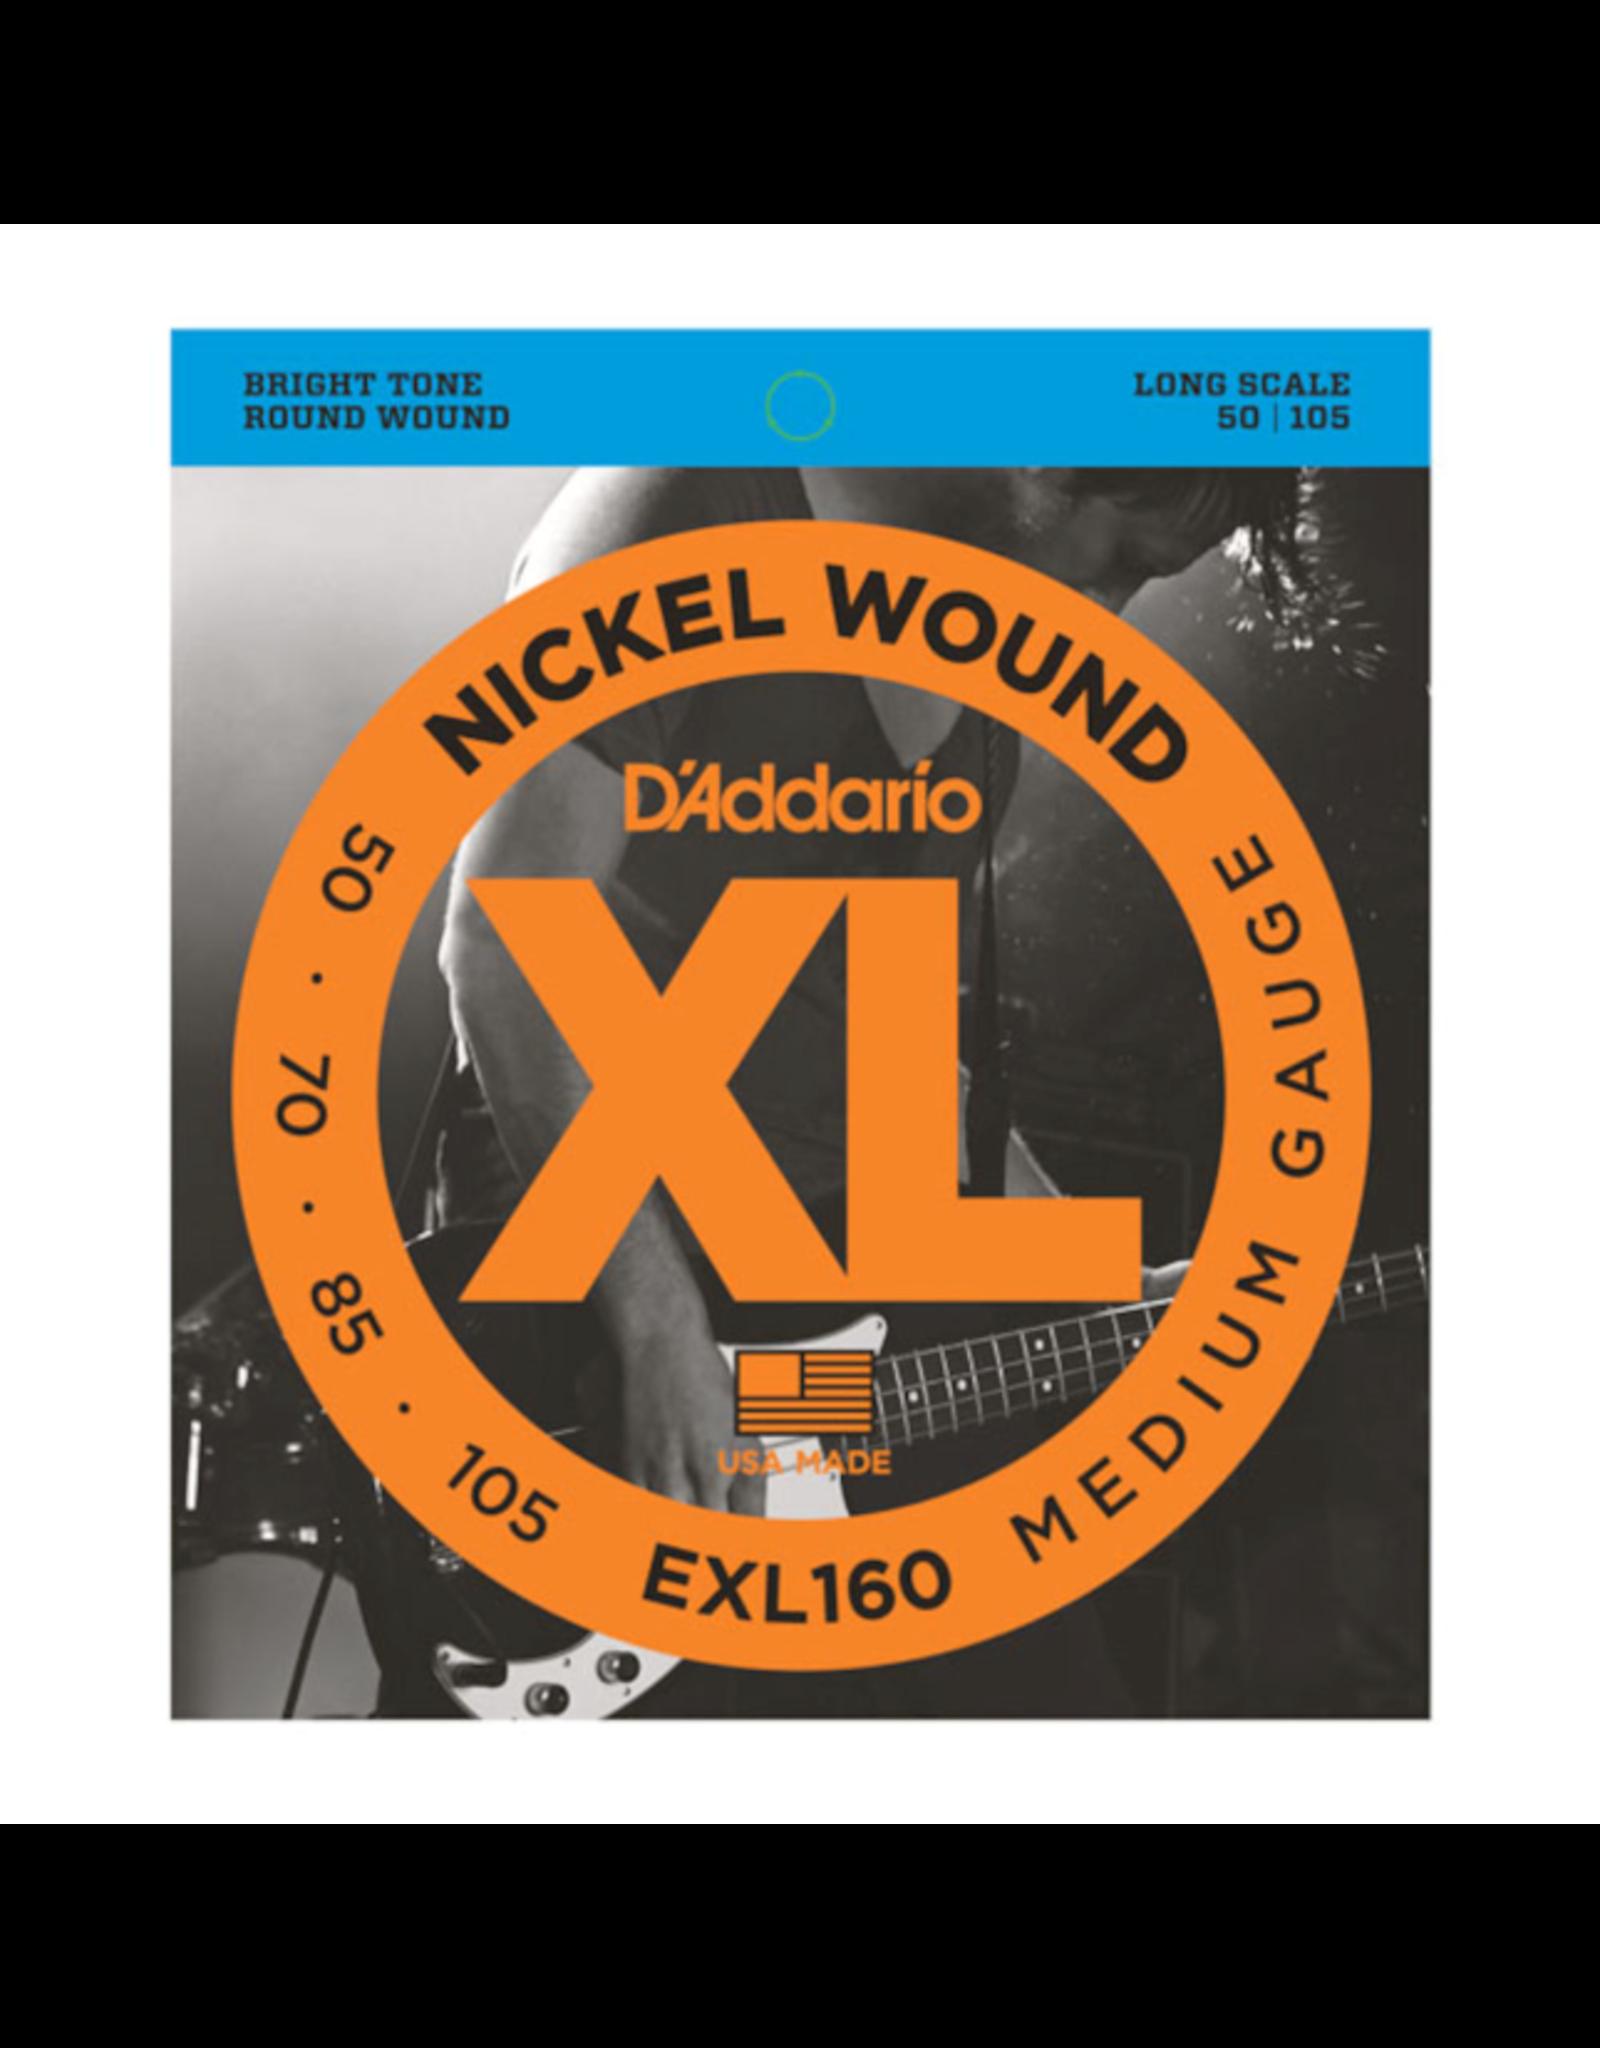 D'Addario D'Addario EXL160 50-105